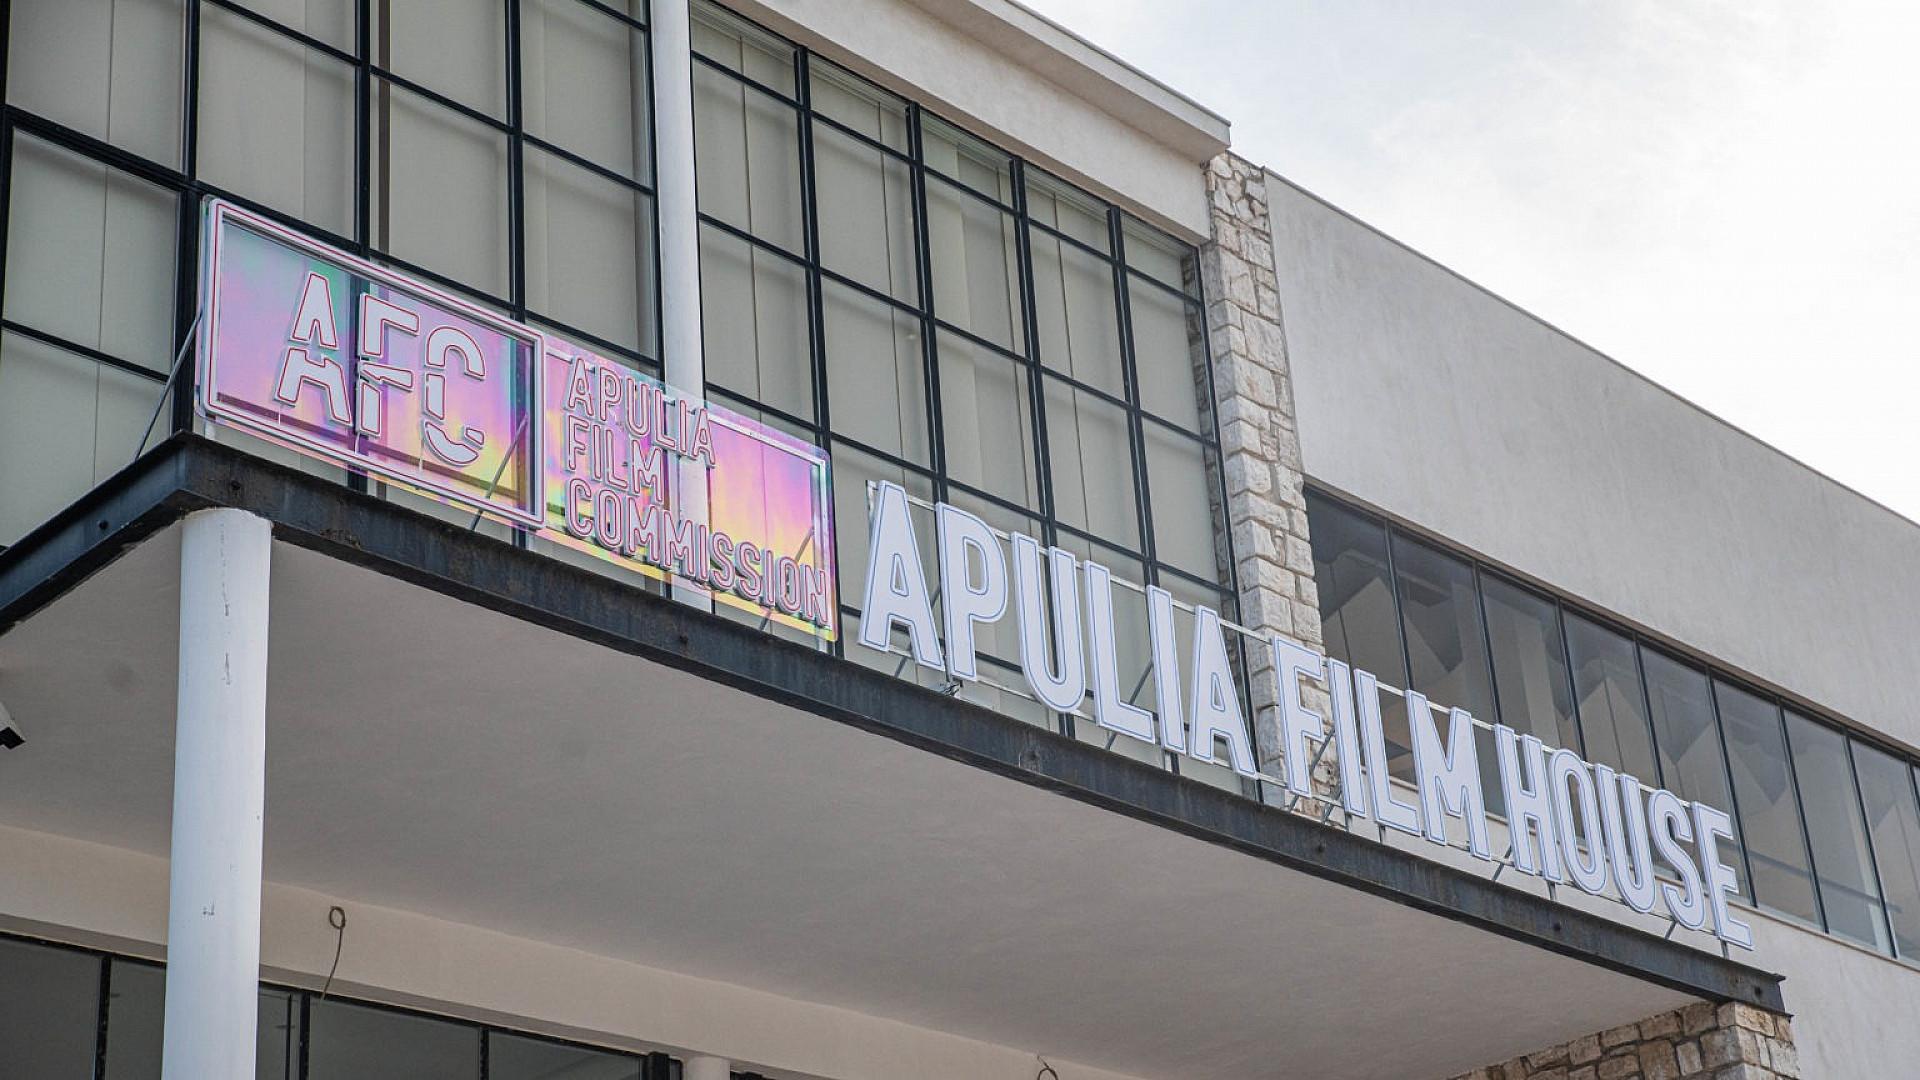 Apulia Film House: mostra permanente in Fiera